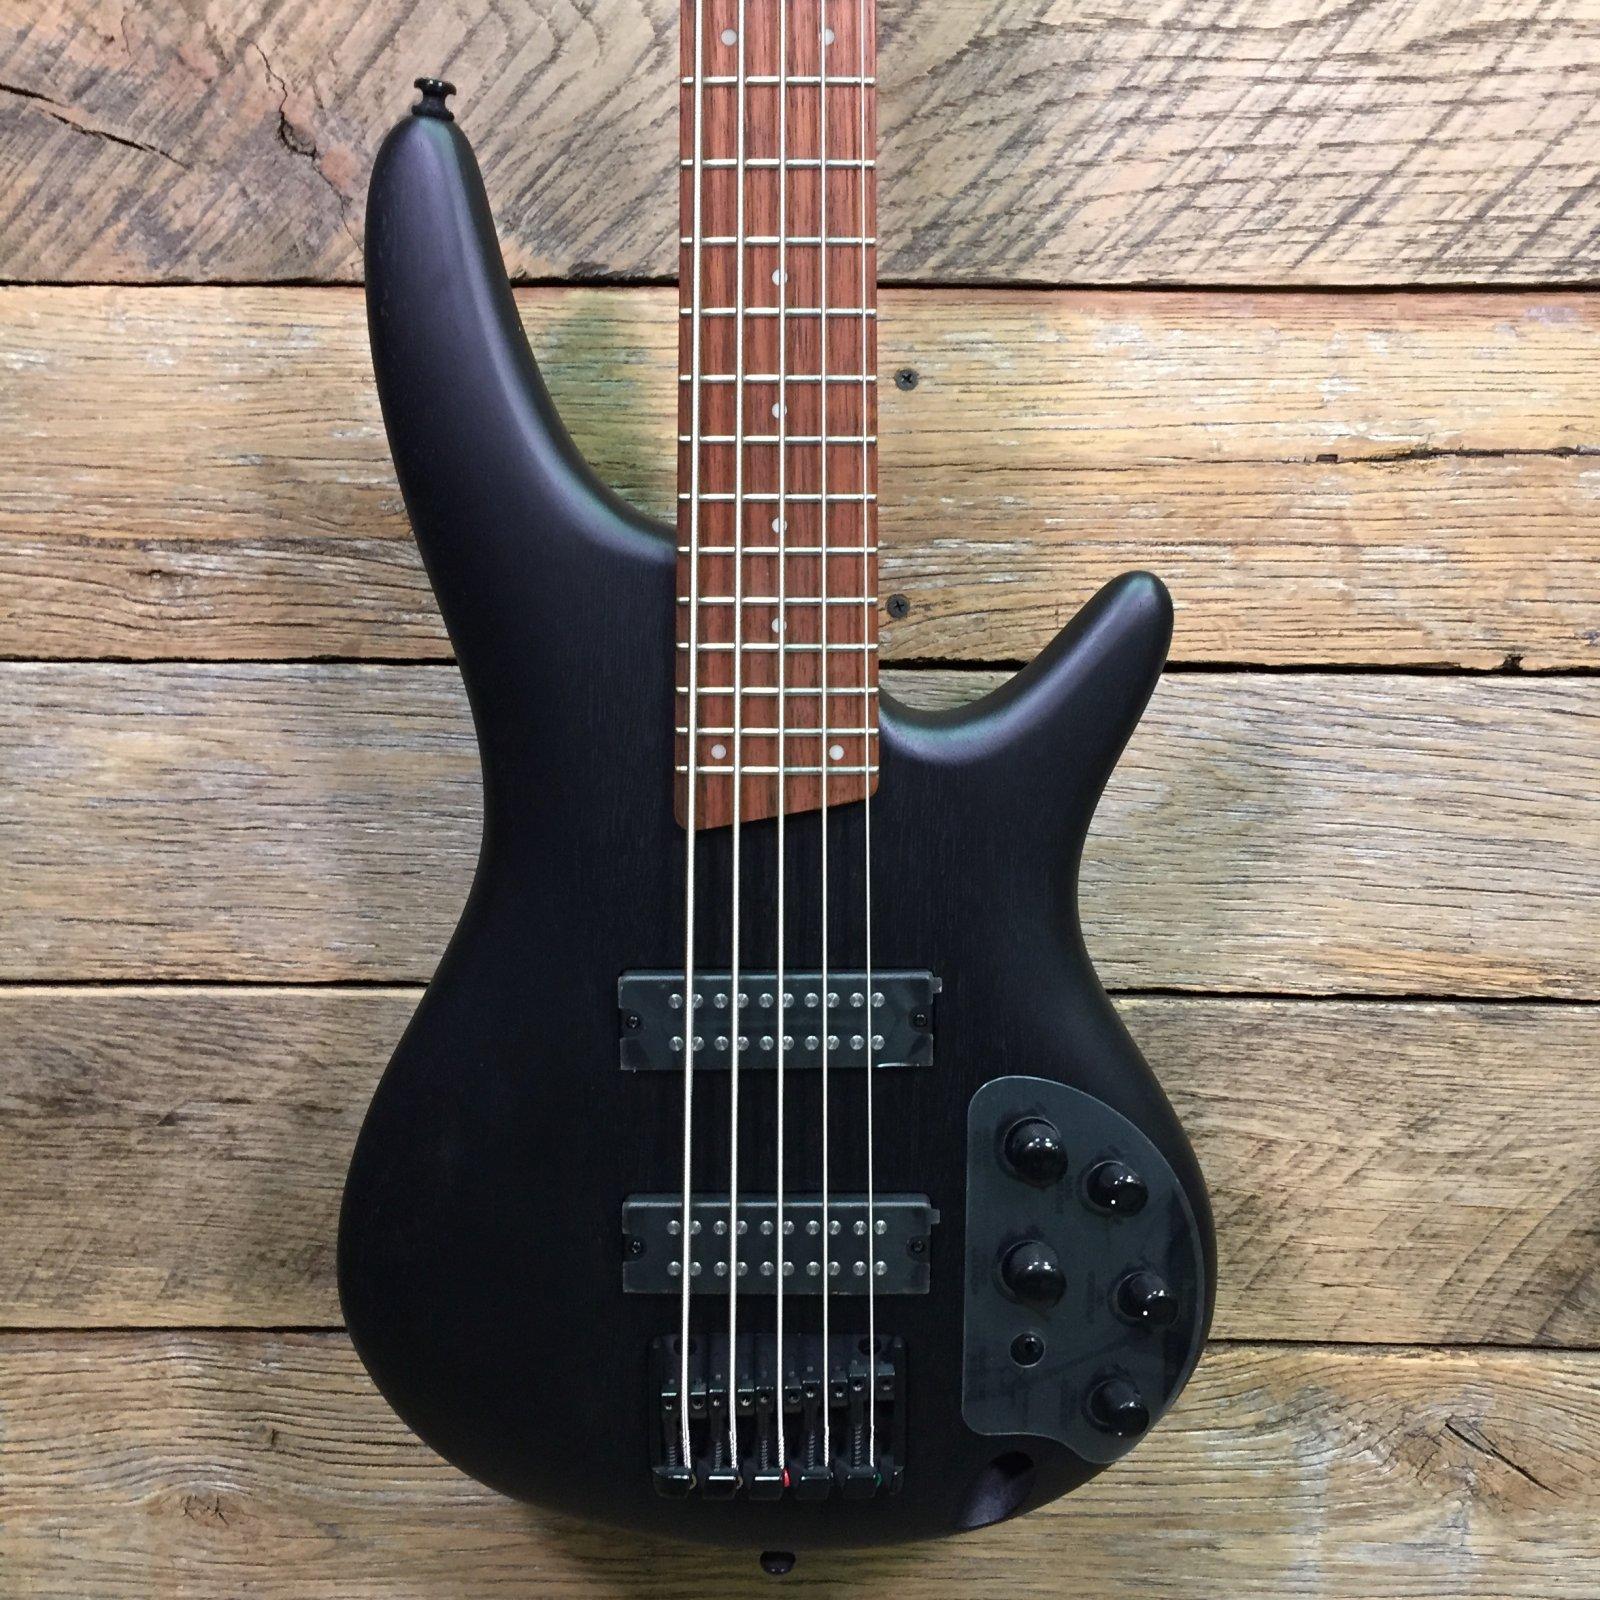 Ibanez SR-305E-BWK 5 String Bass